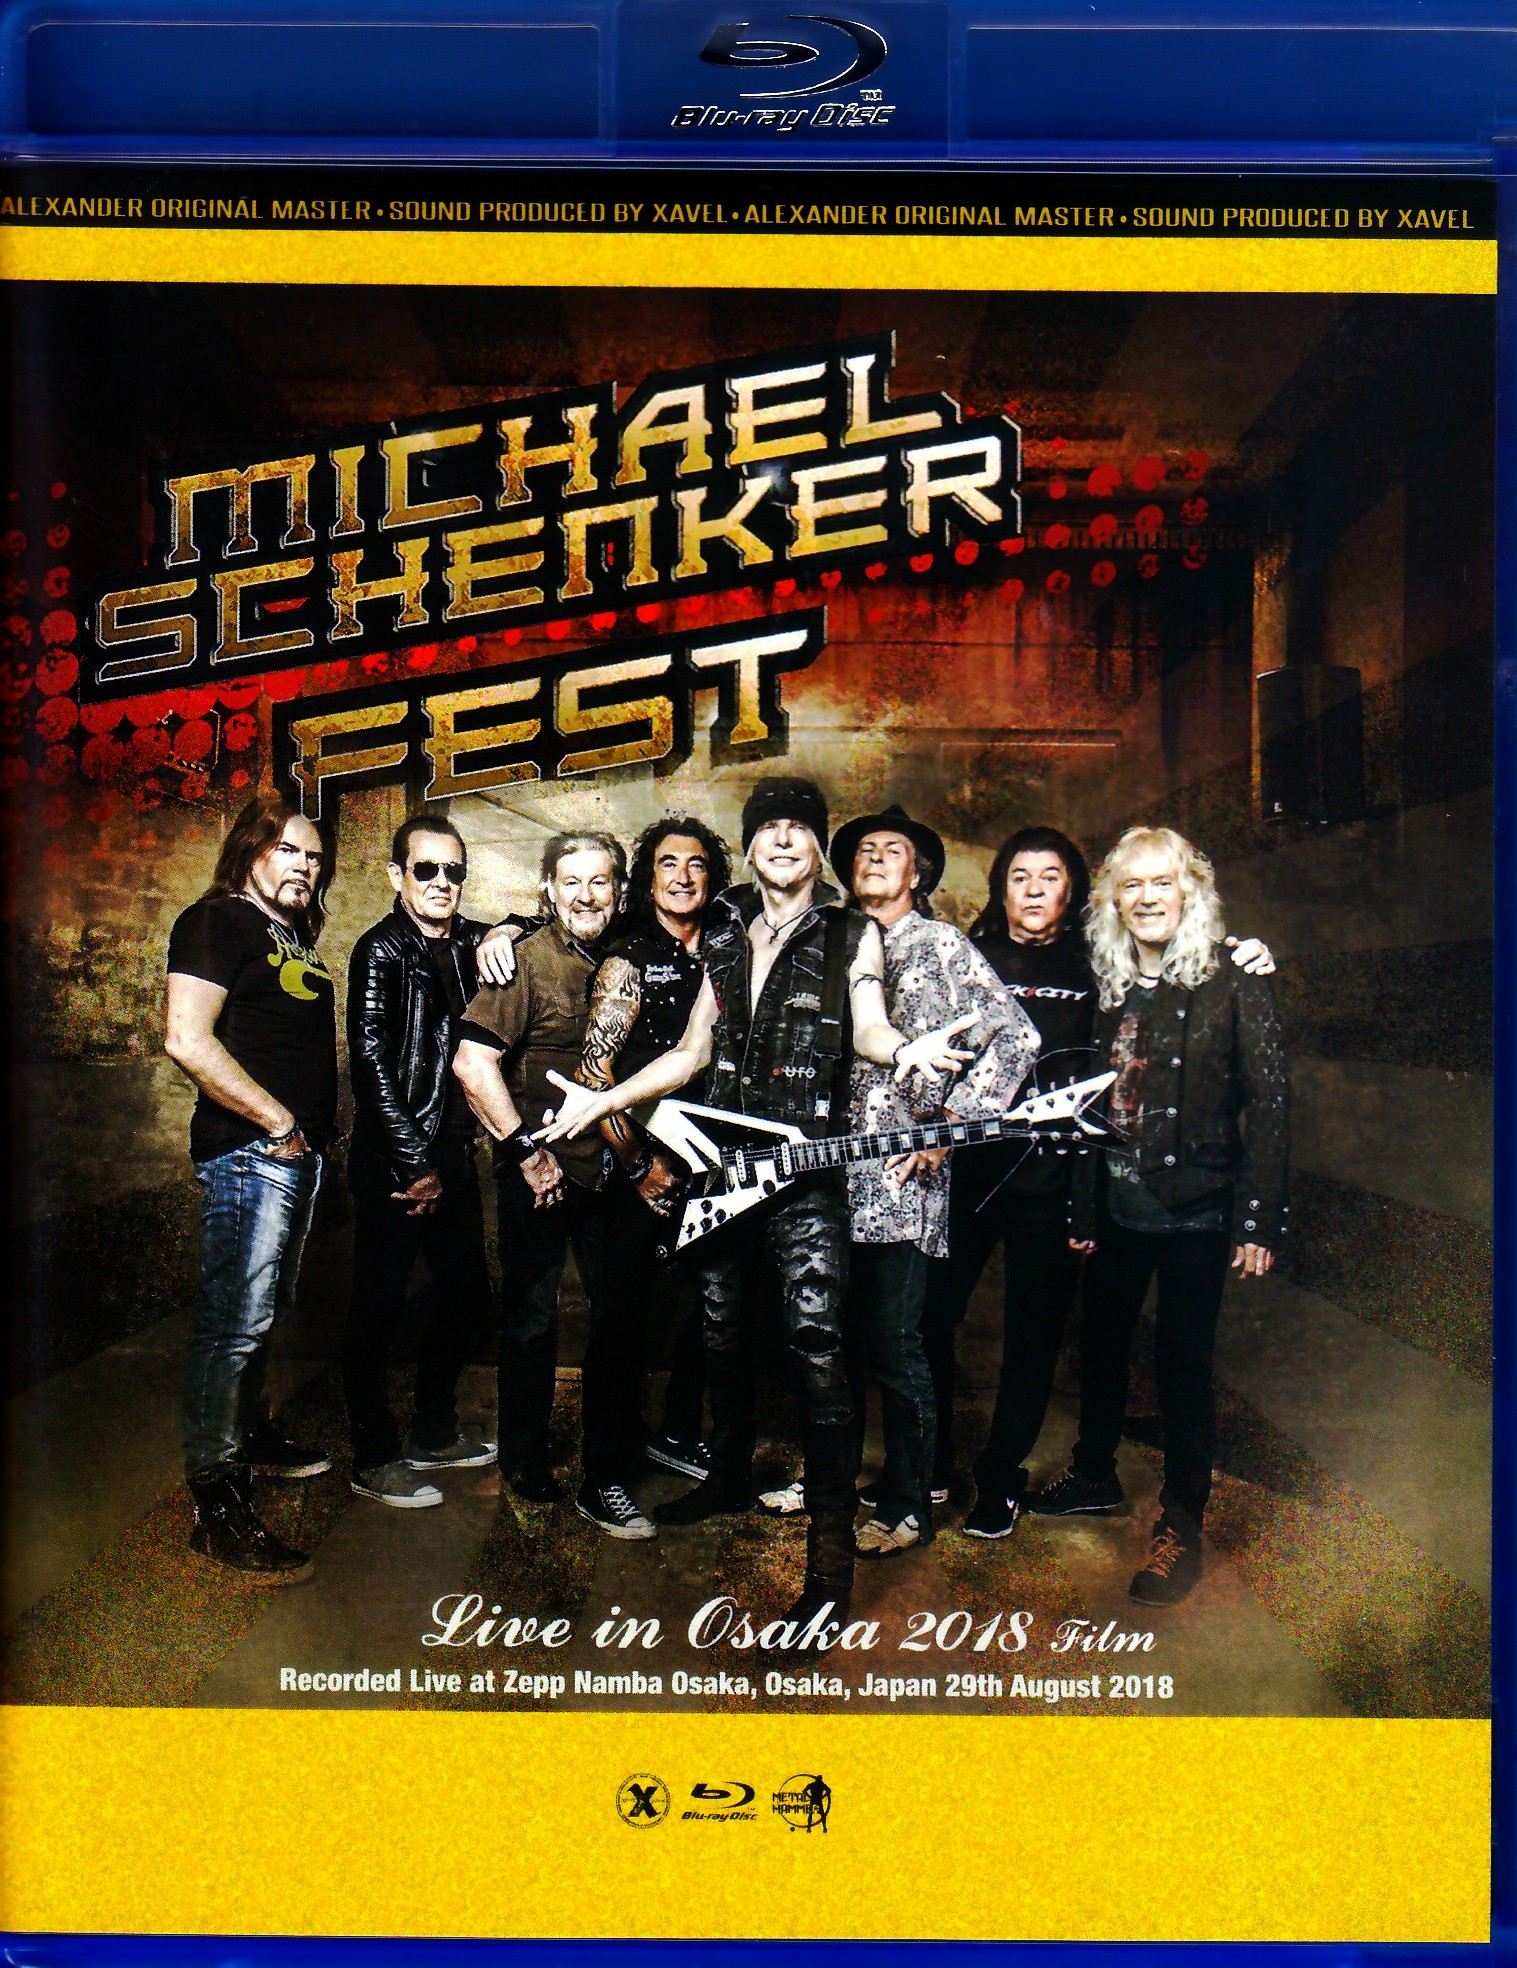 Michael Schenker Fest マイケル・シェンカー/Osaka,Japan 2018 Blu-Ray Ver.